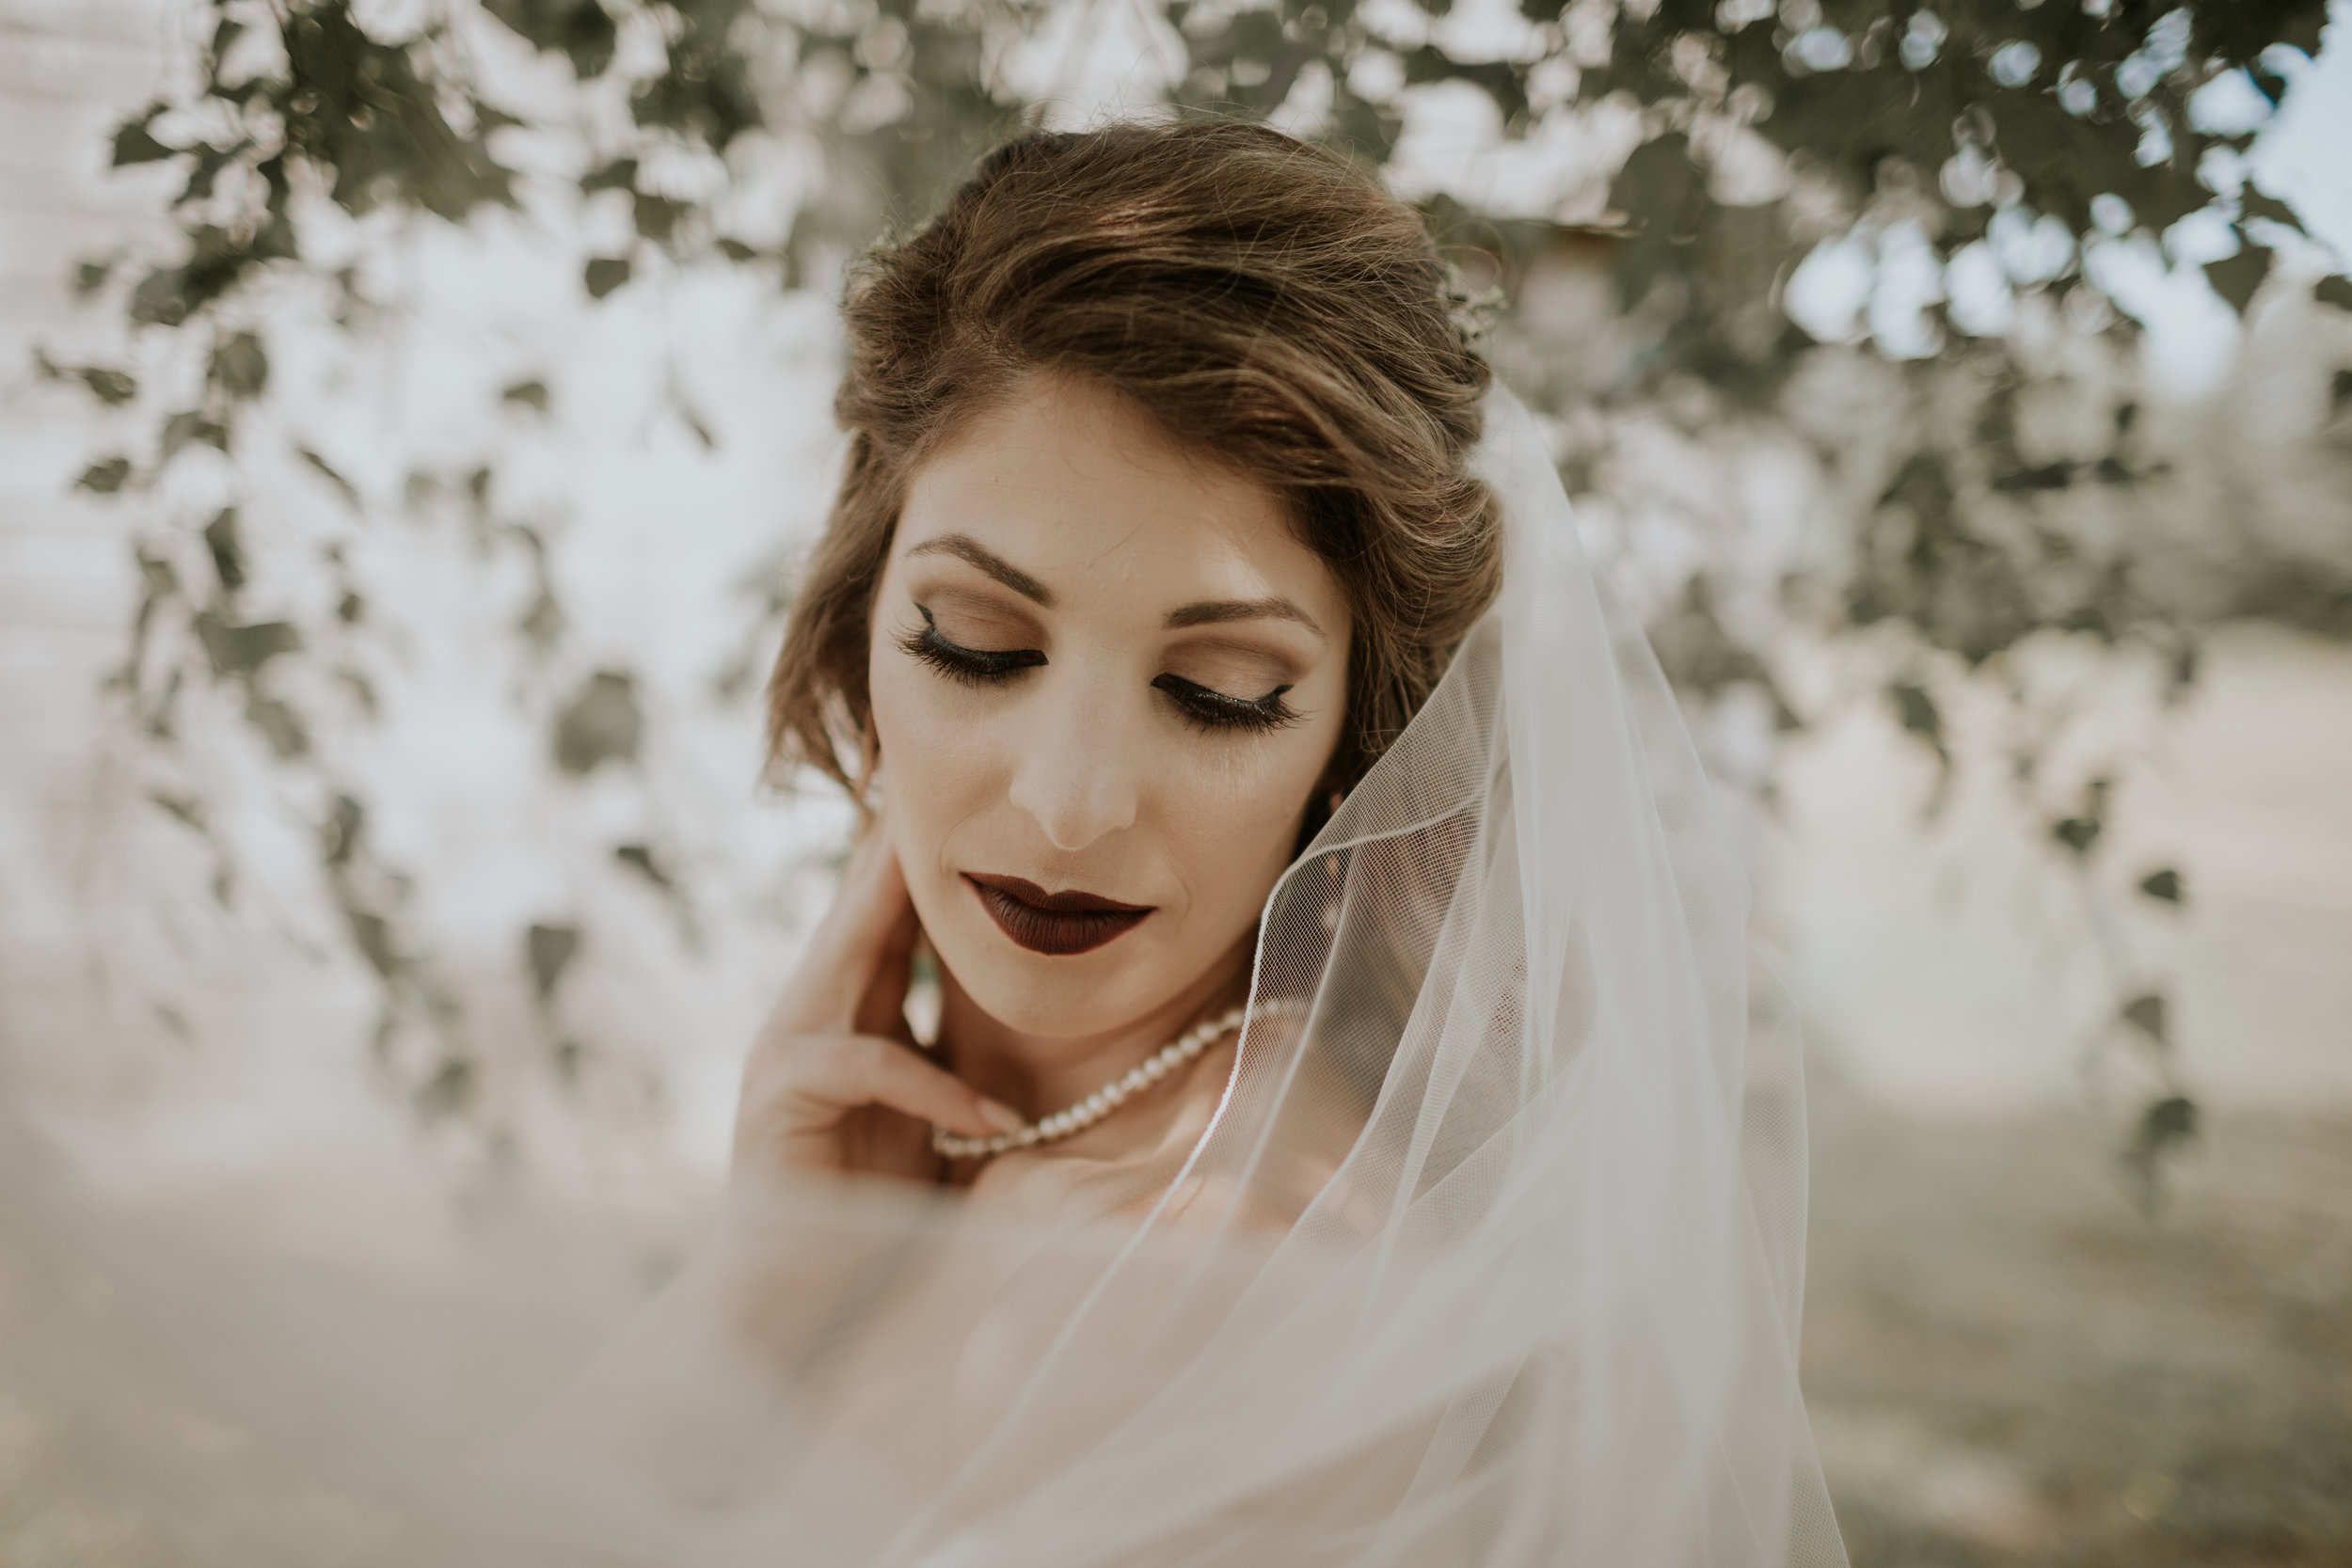 Olympic-Peninsula-Wedding-Photographer-PNW-Forks-Port-Angeles-Kayla-Dawn-Photography-engagement-Olympic-National-Park-124.jpg